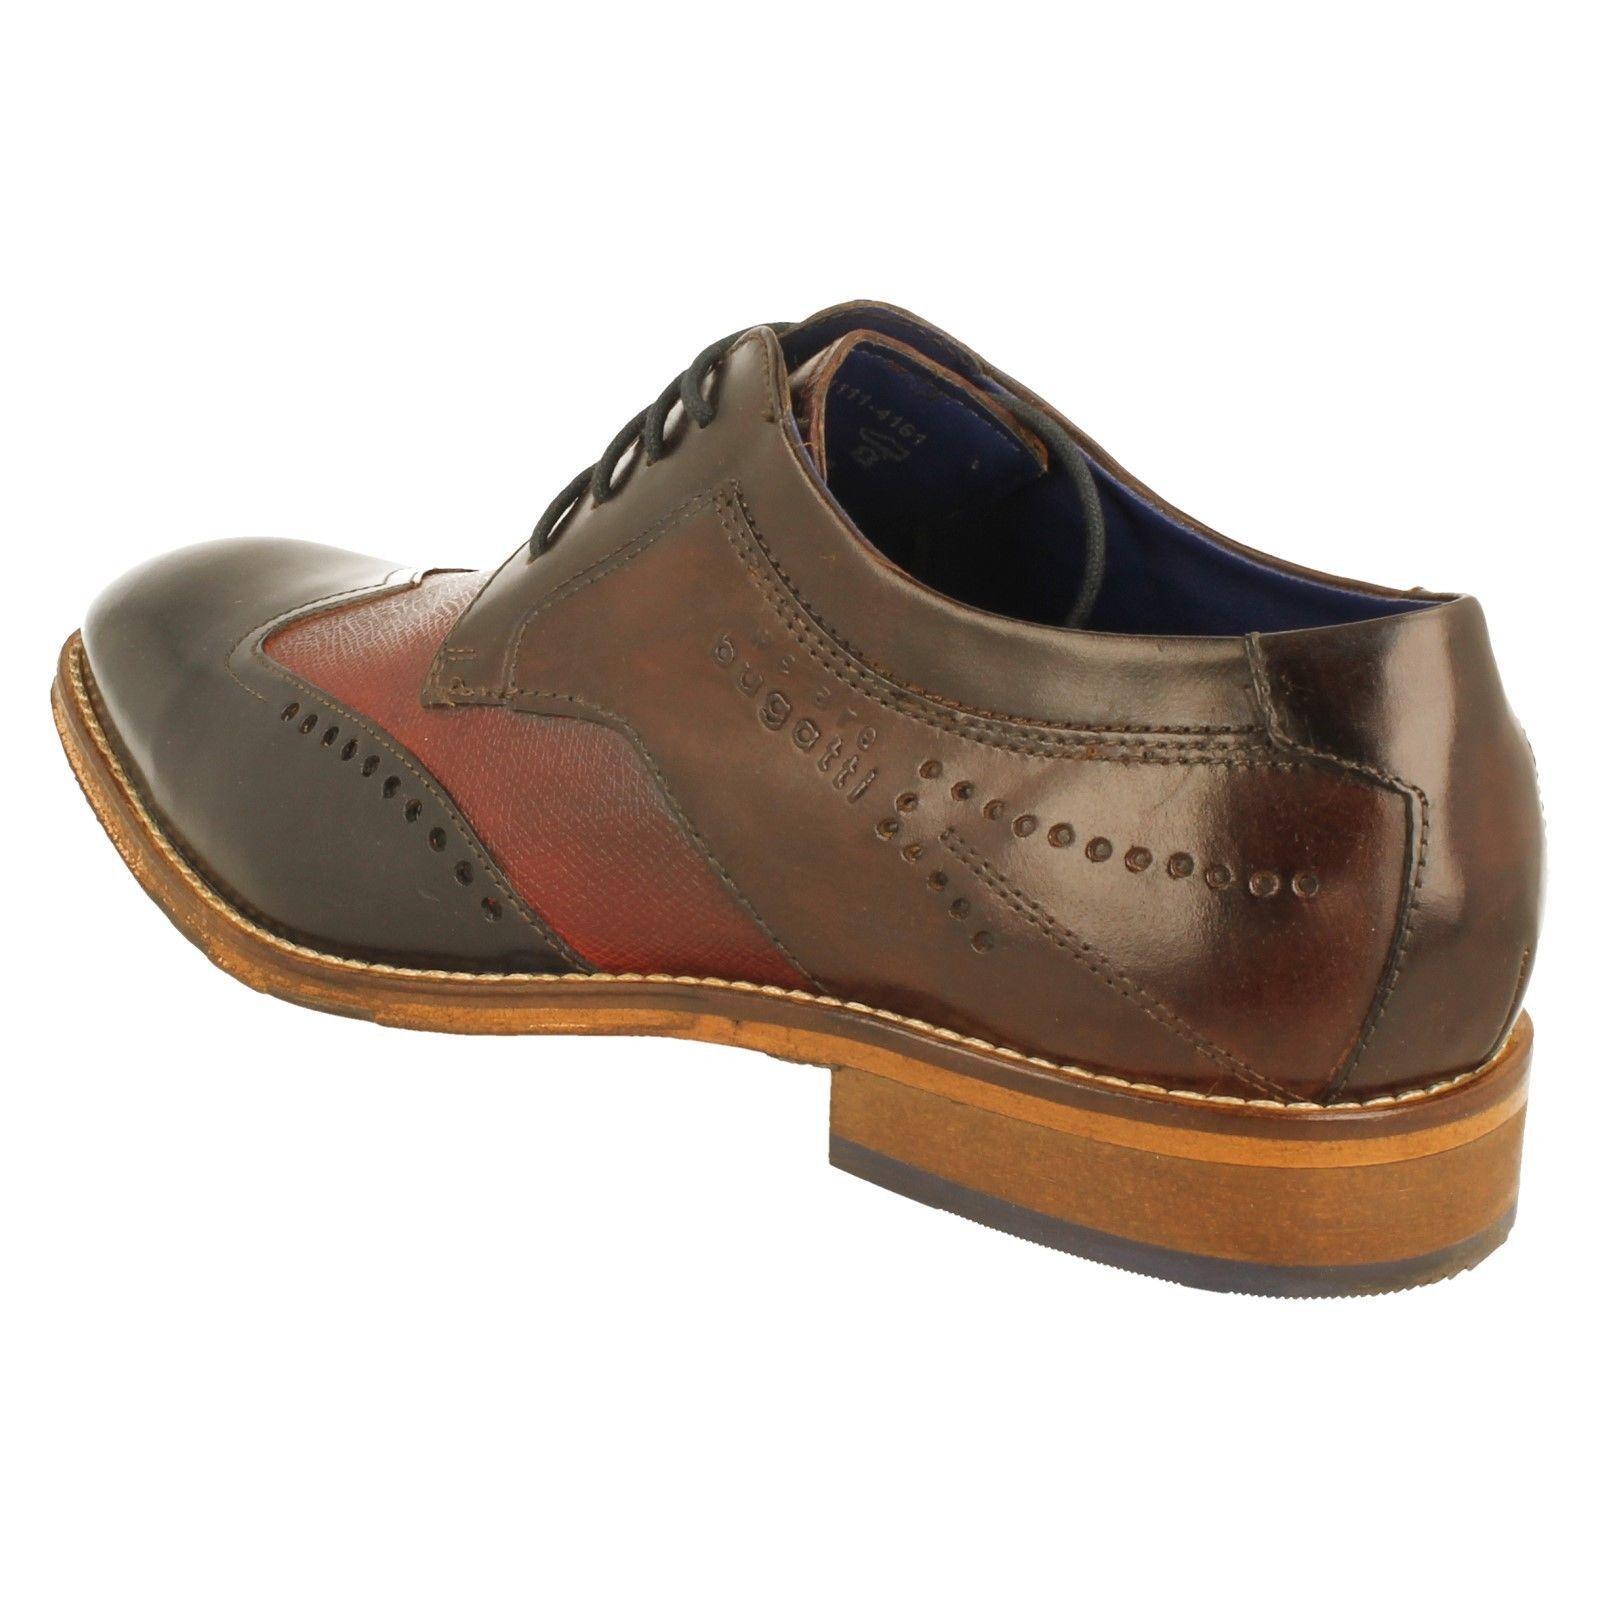 Uomo Formal Bugatti Dark Braun/Dark Blau Lace Up Leder Formal Uomo Smart Schuhes 312-52901 f2f36d